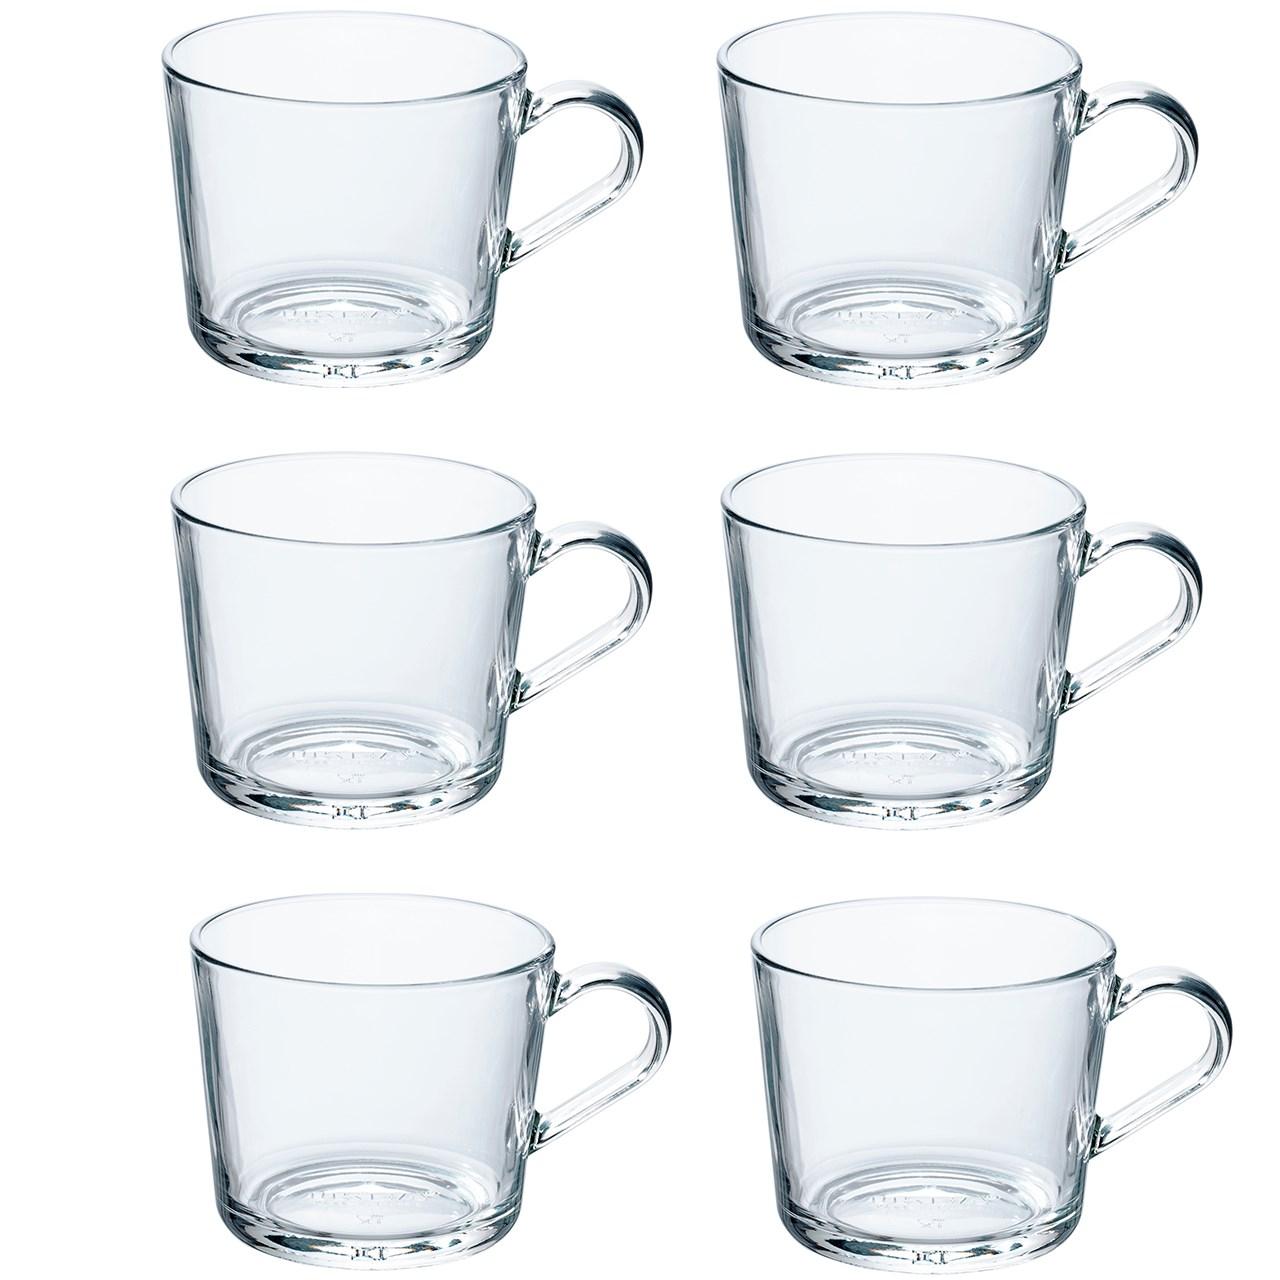 عکس فنجان چای خوری Ikea مدل 365 بسته 6 عددی